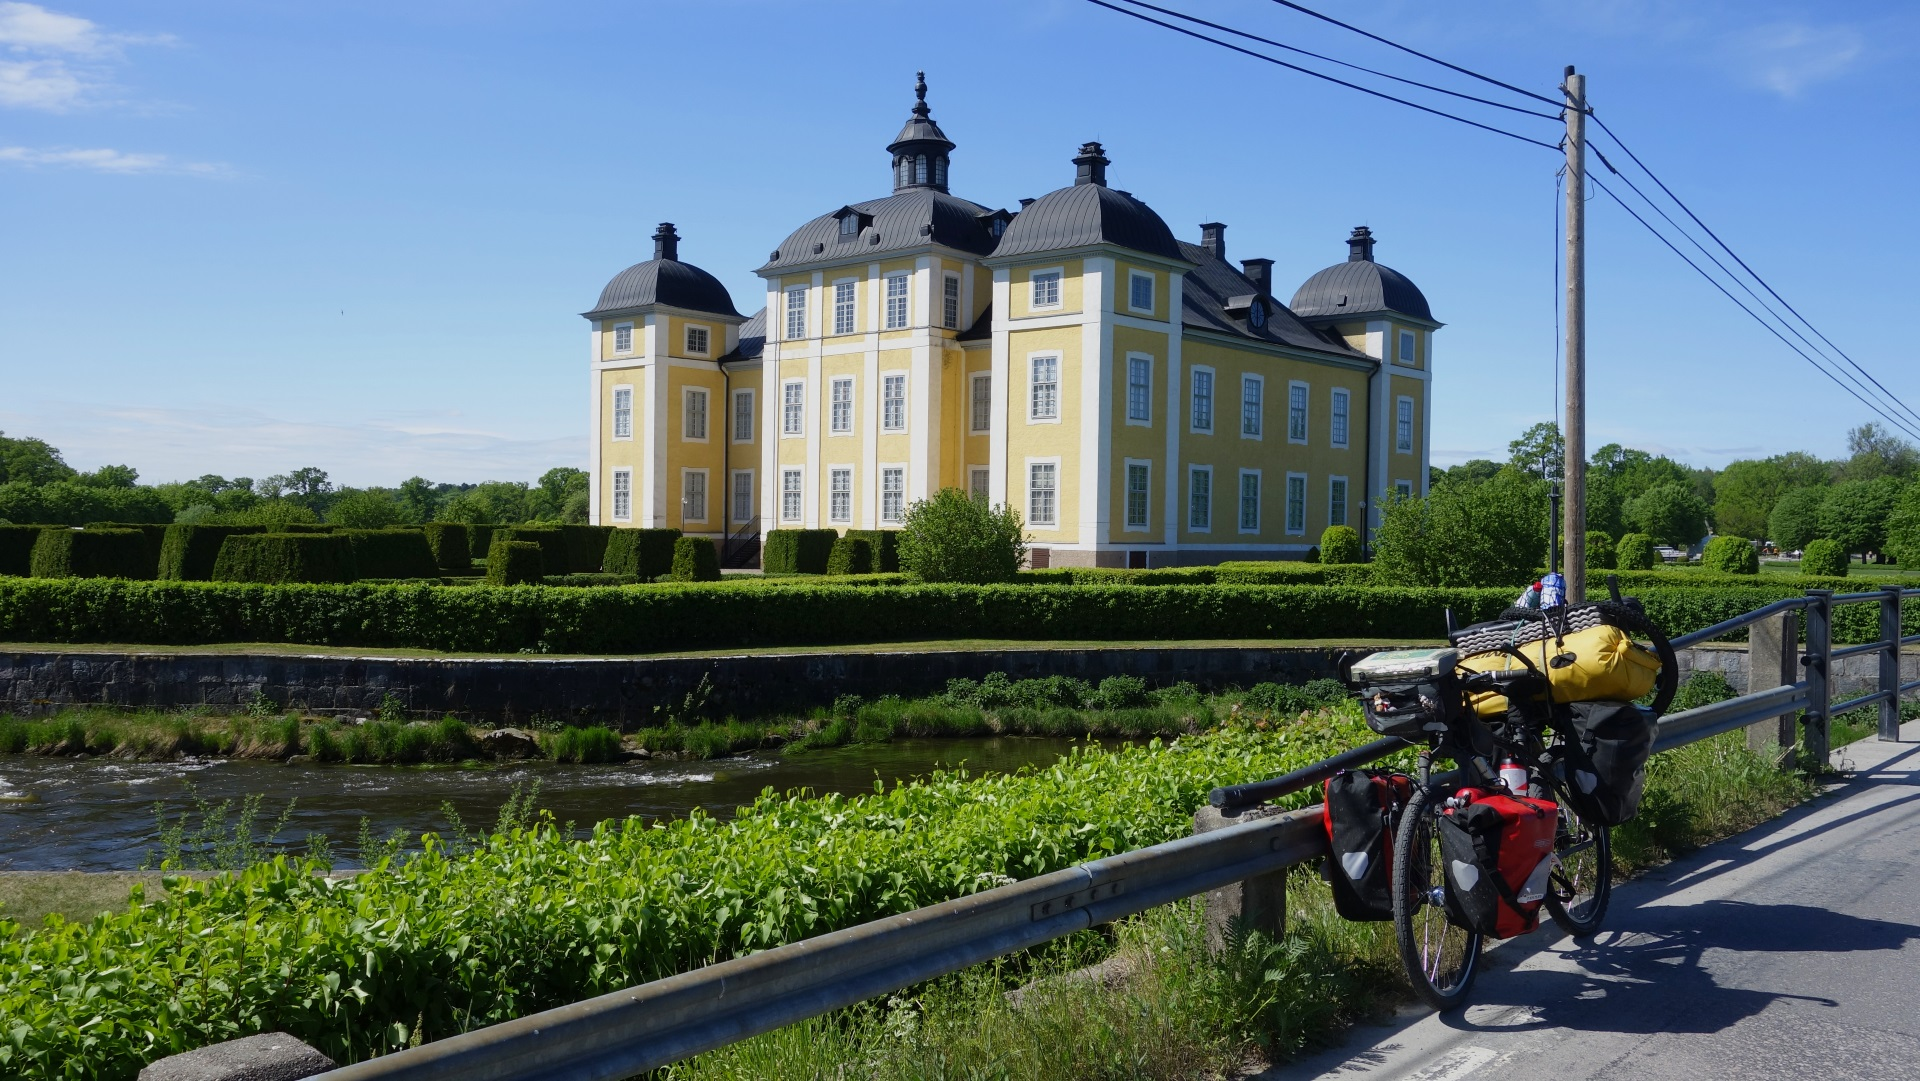 Sweden, to re-encounter with an old friend - Los viajes de Manel